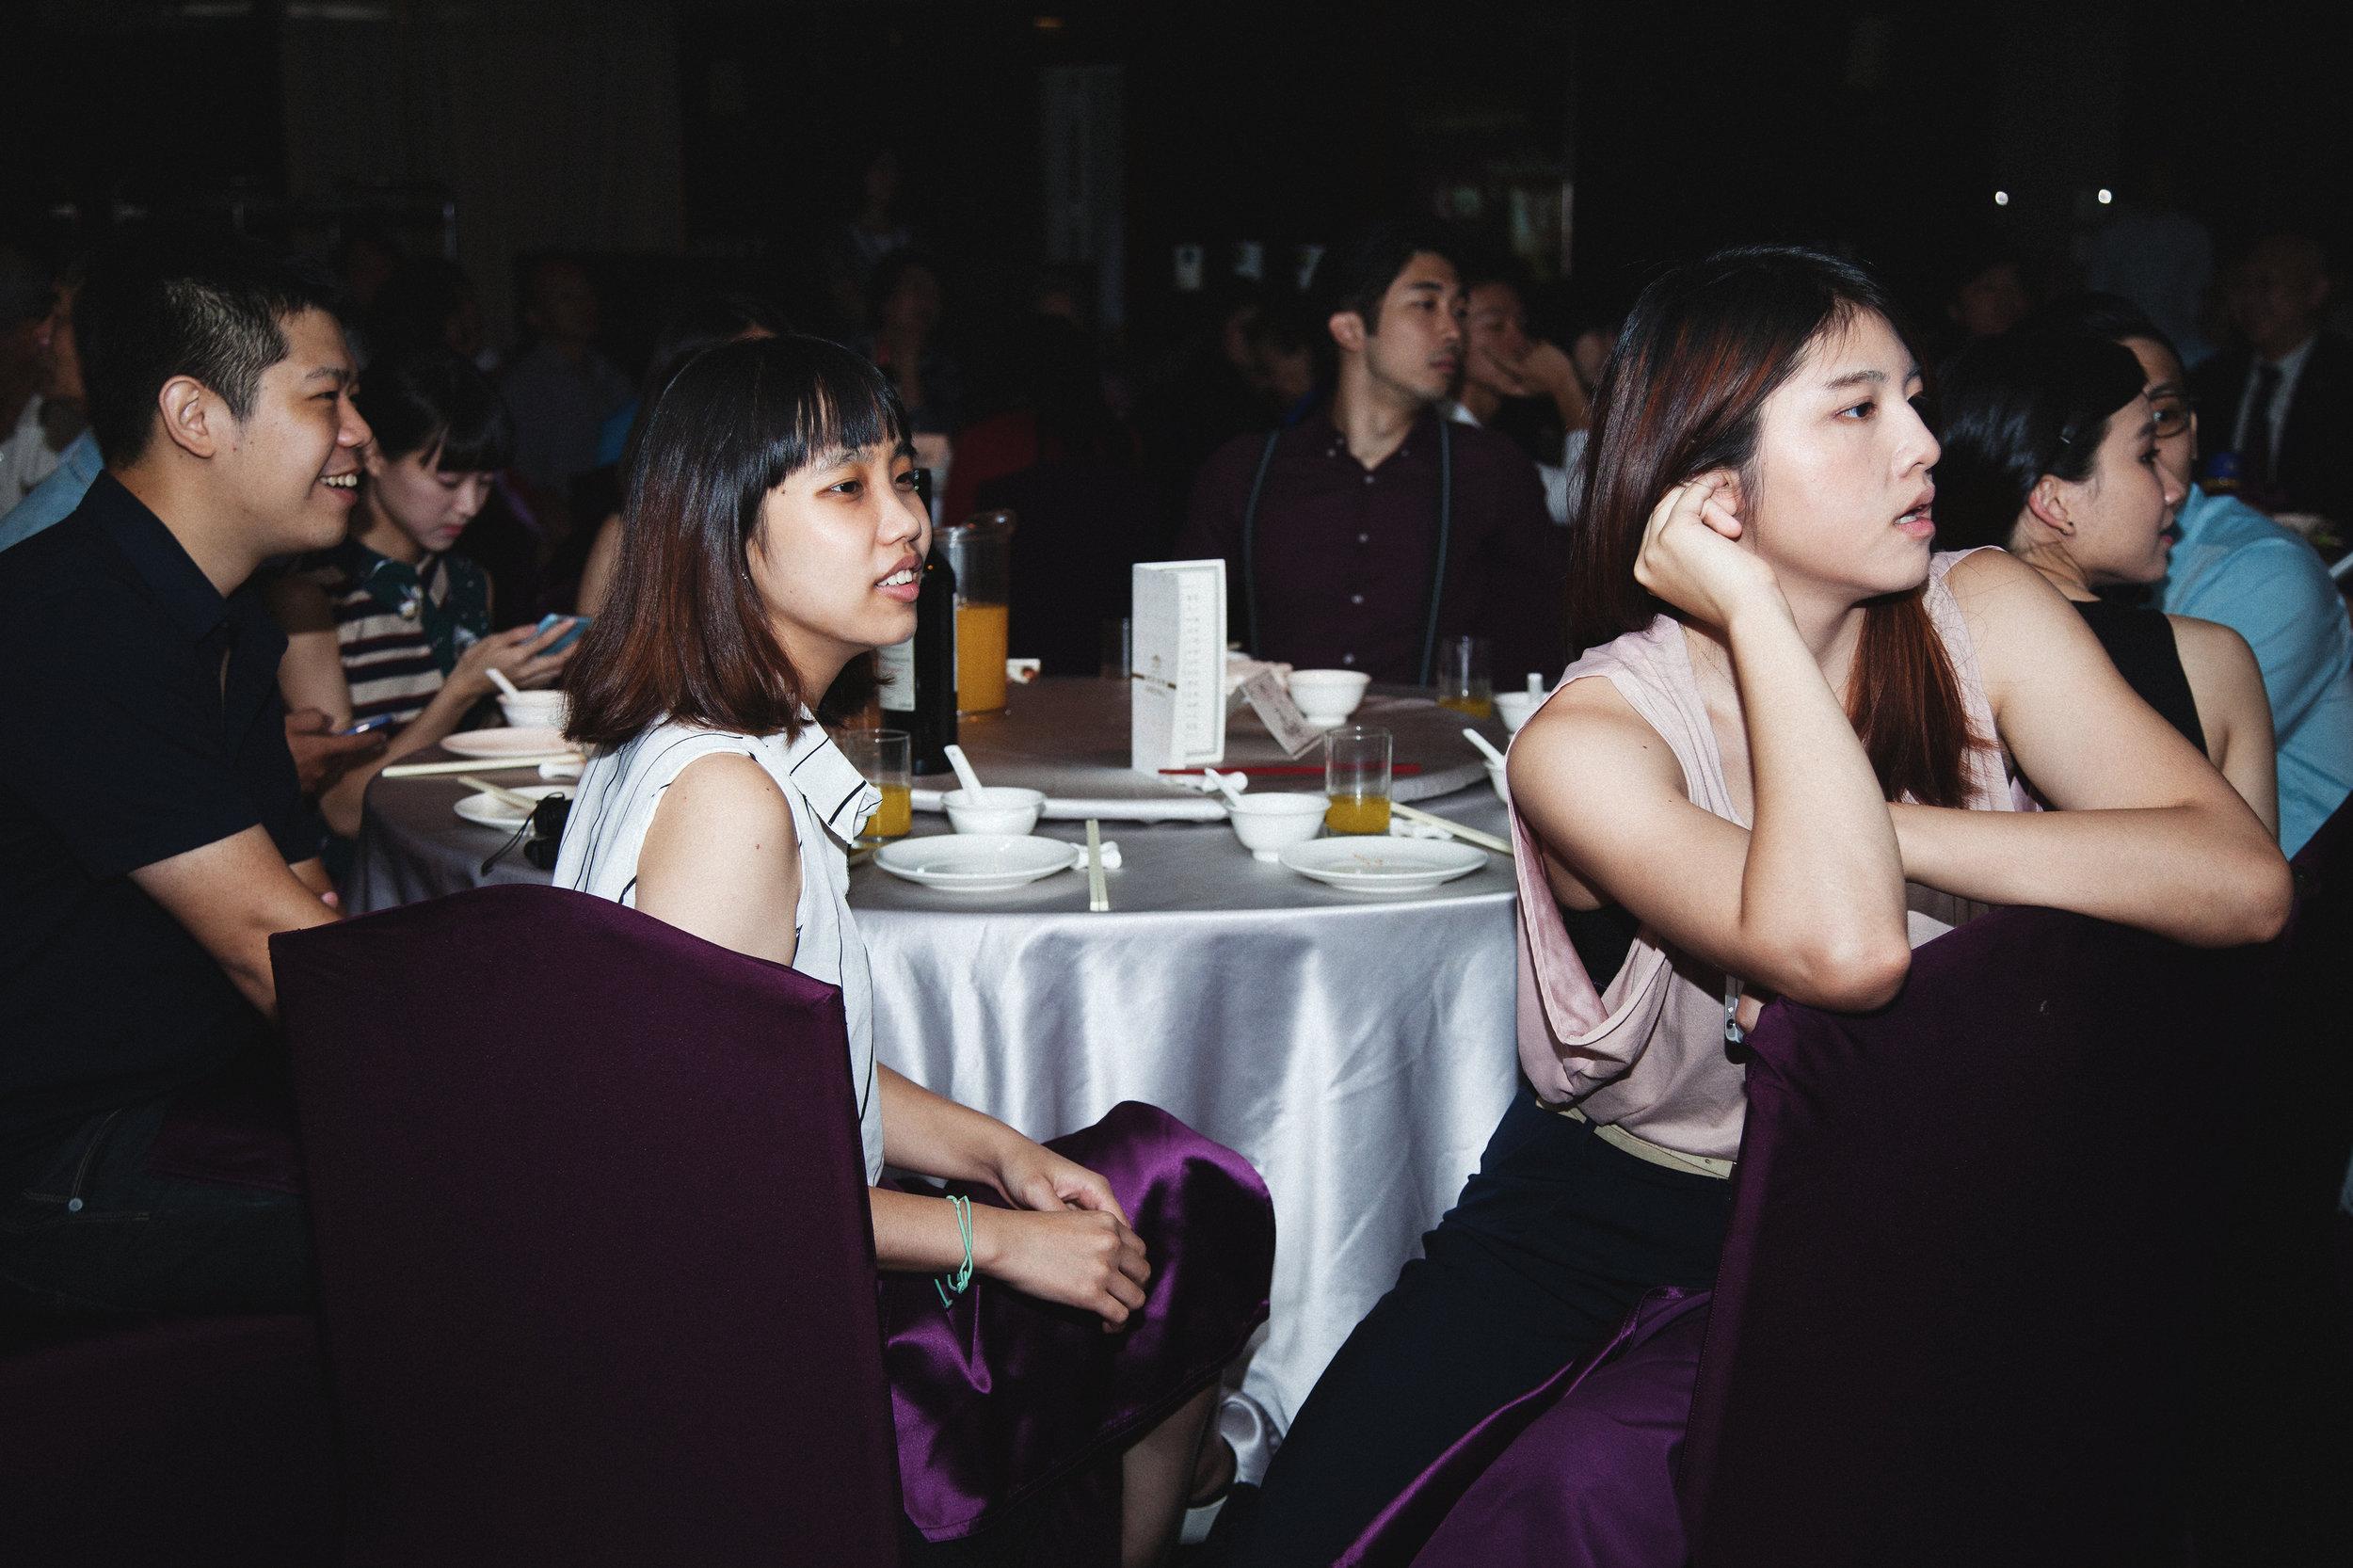 [JC]CREATIVE 女性攝影師 北投儷宴會館 補請台灣WEDDING    自然風格 台北婚攝推 女婚攝  桃園婚攝   圖像00166.JPG